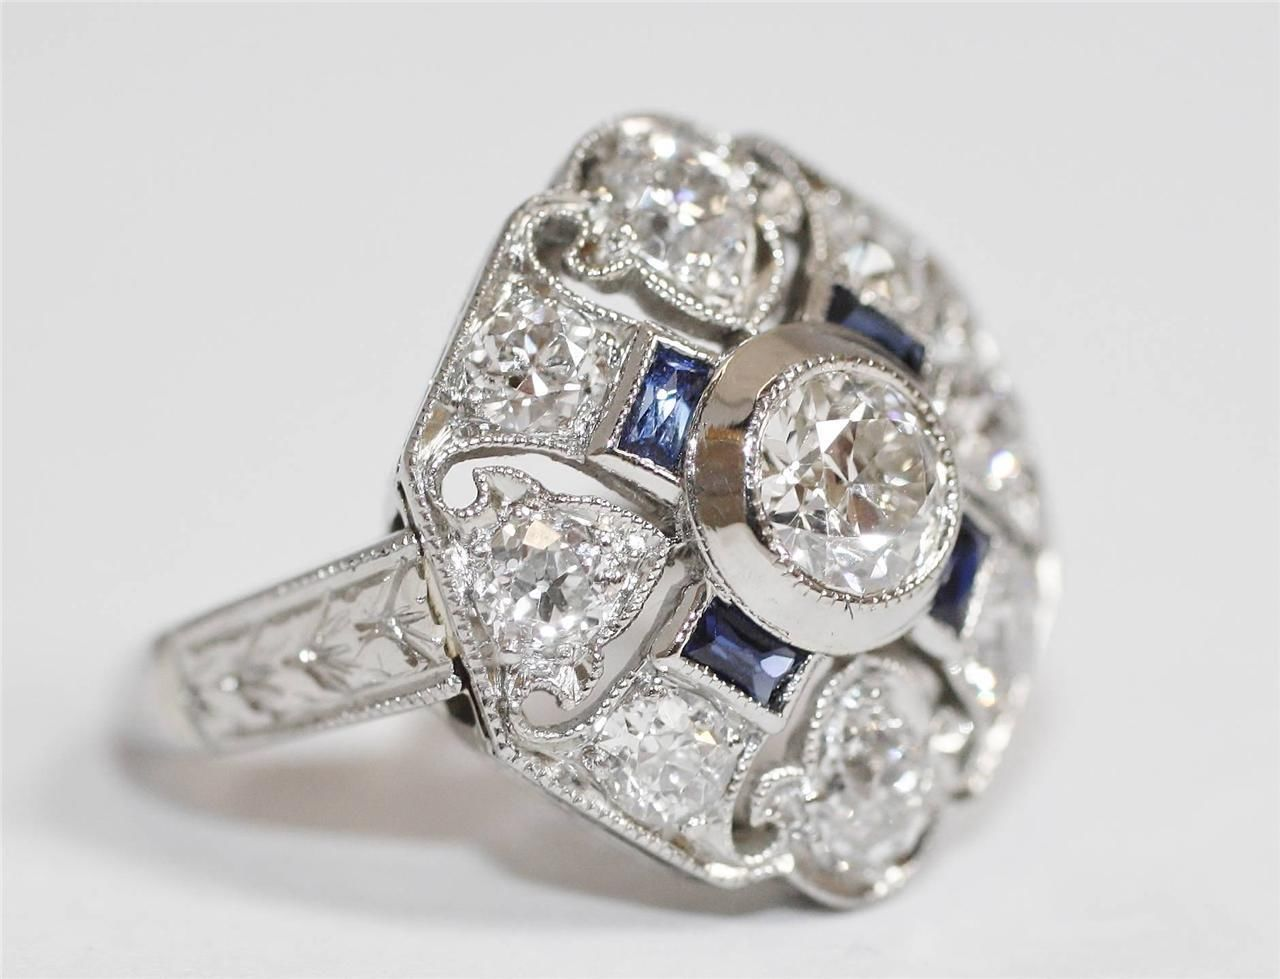 Where to Sell My Jewelry Sell Diamond Rings Hemet California